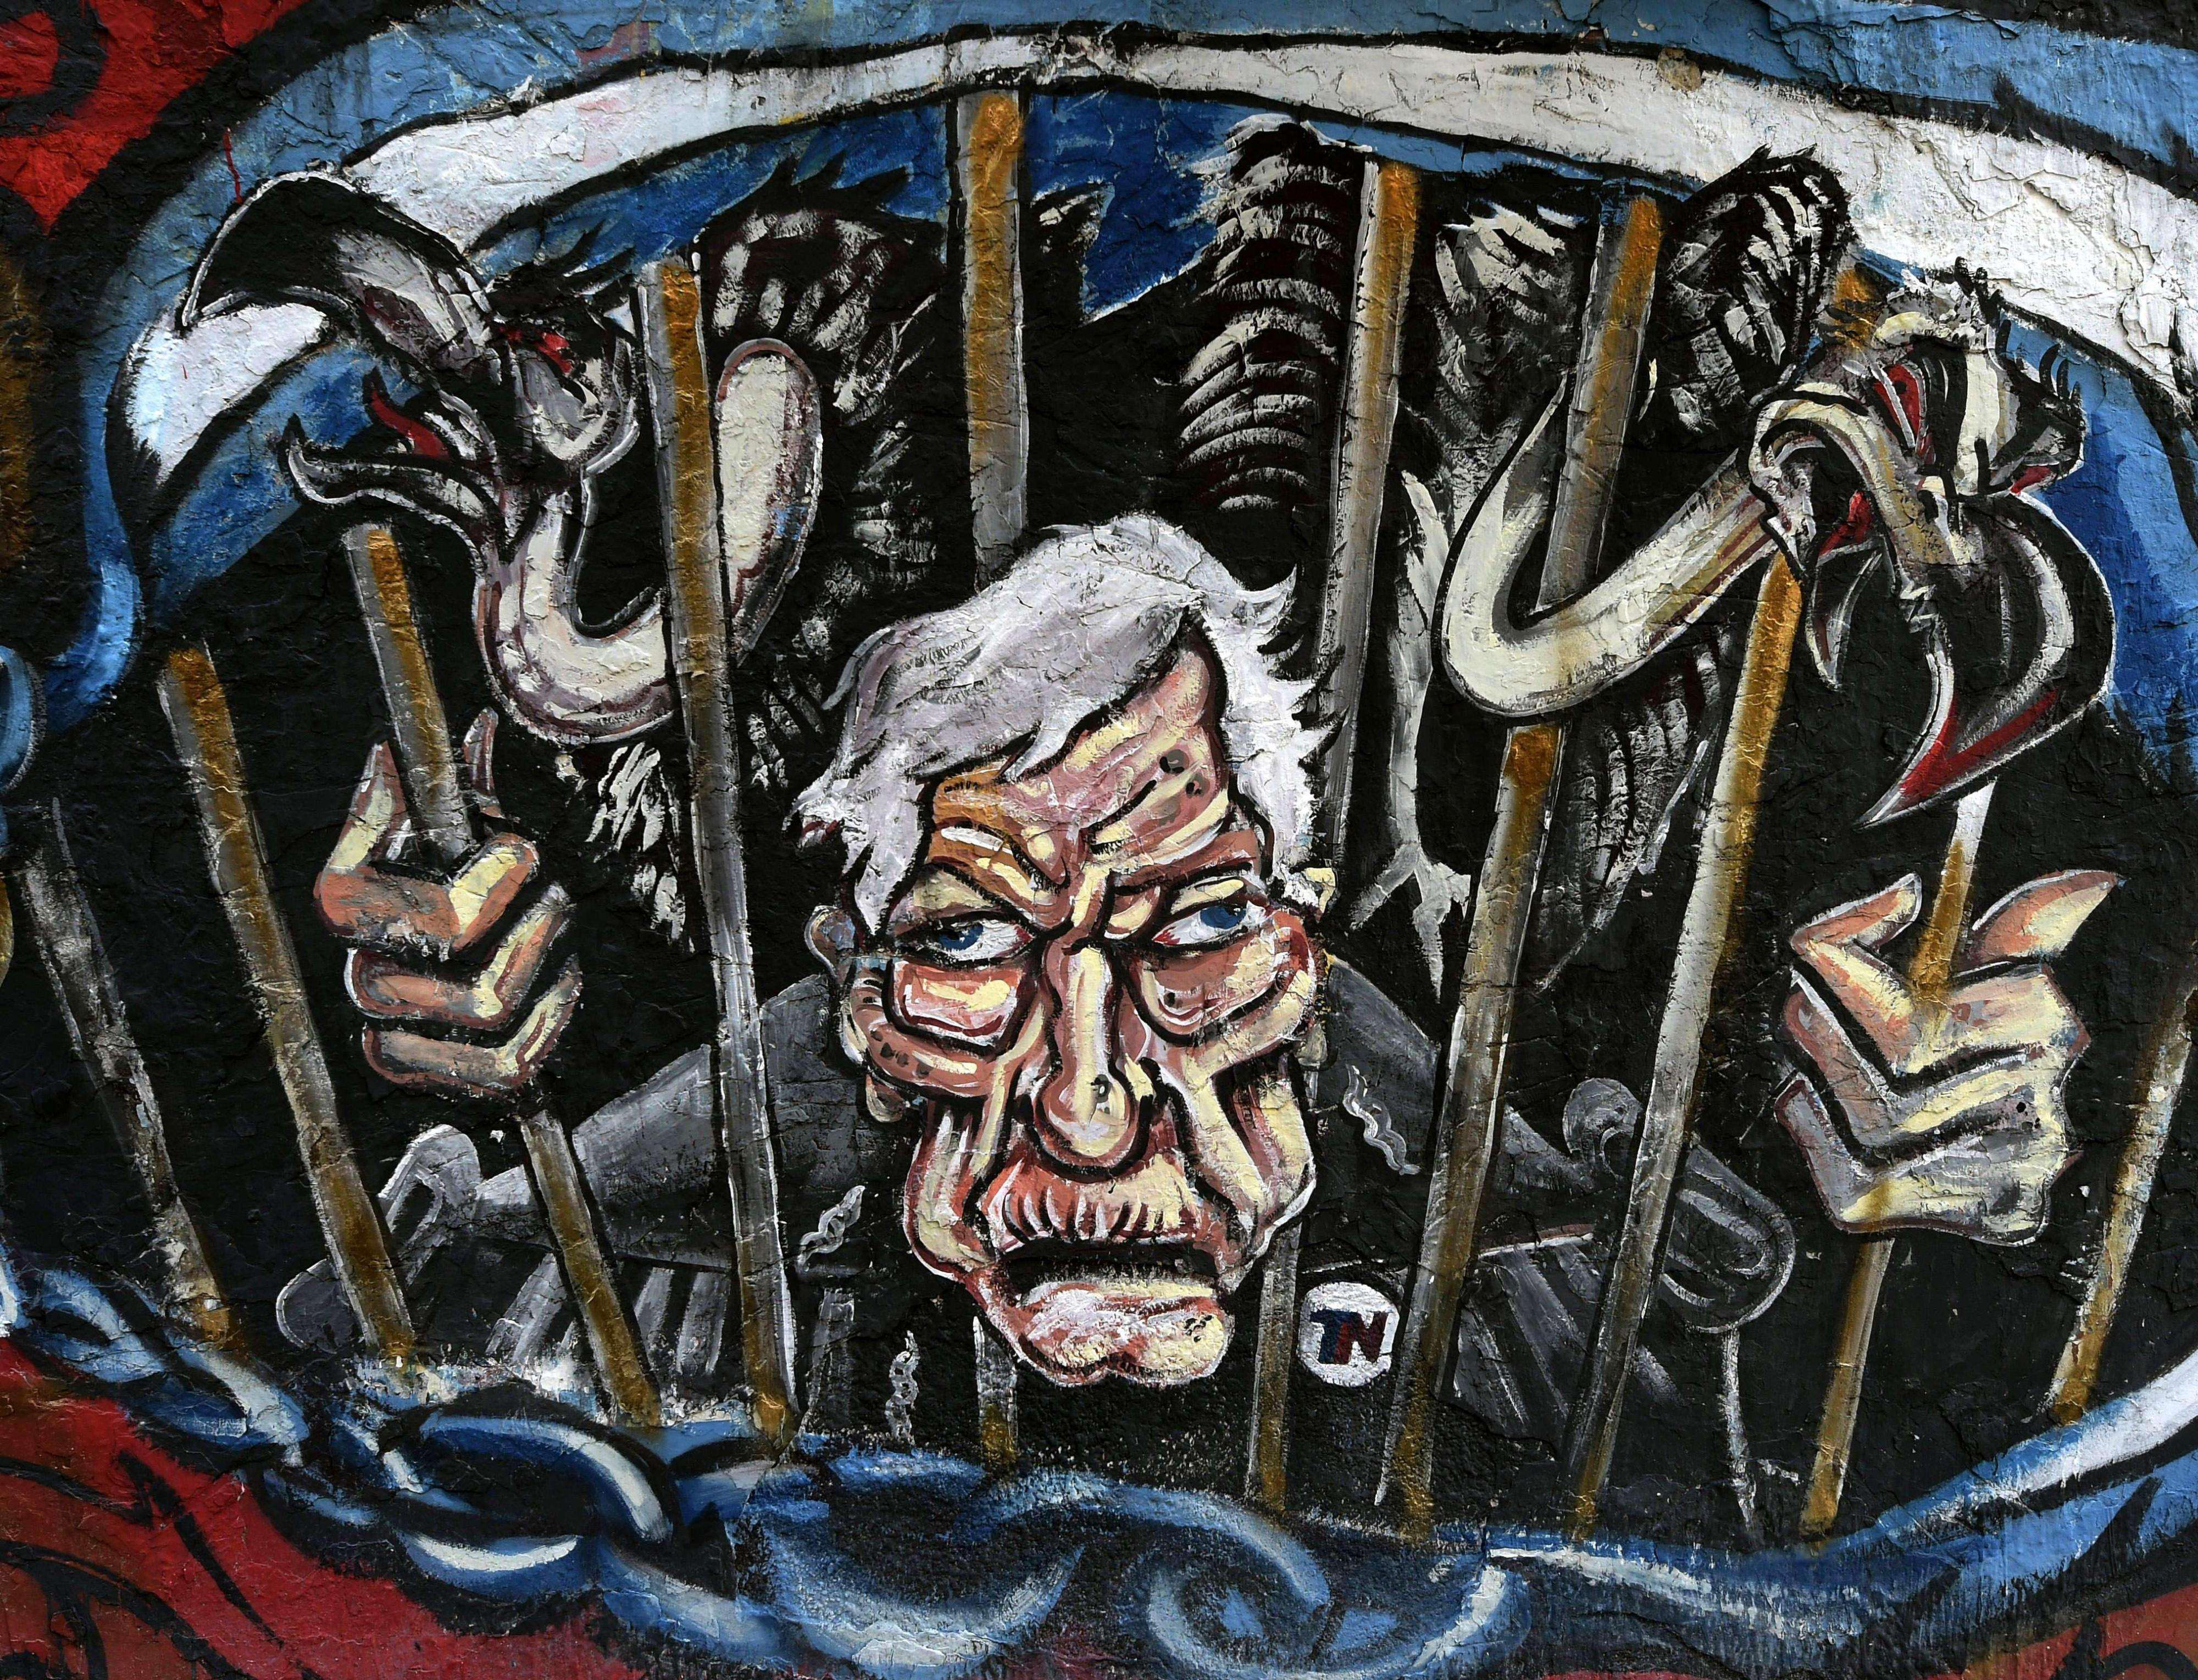 Afiches y graffitis en Argentina, en contra del juez Thomas Griesa. Foto: NA